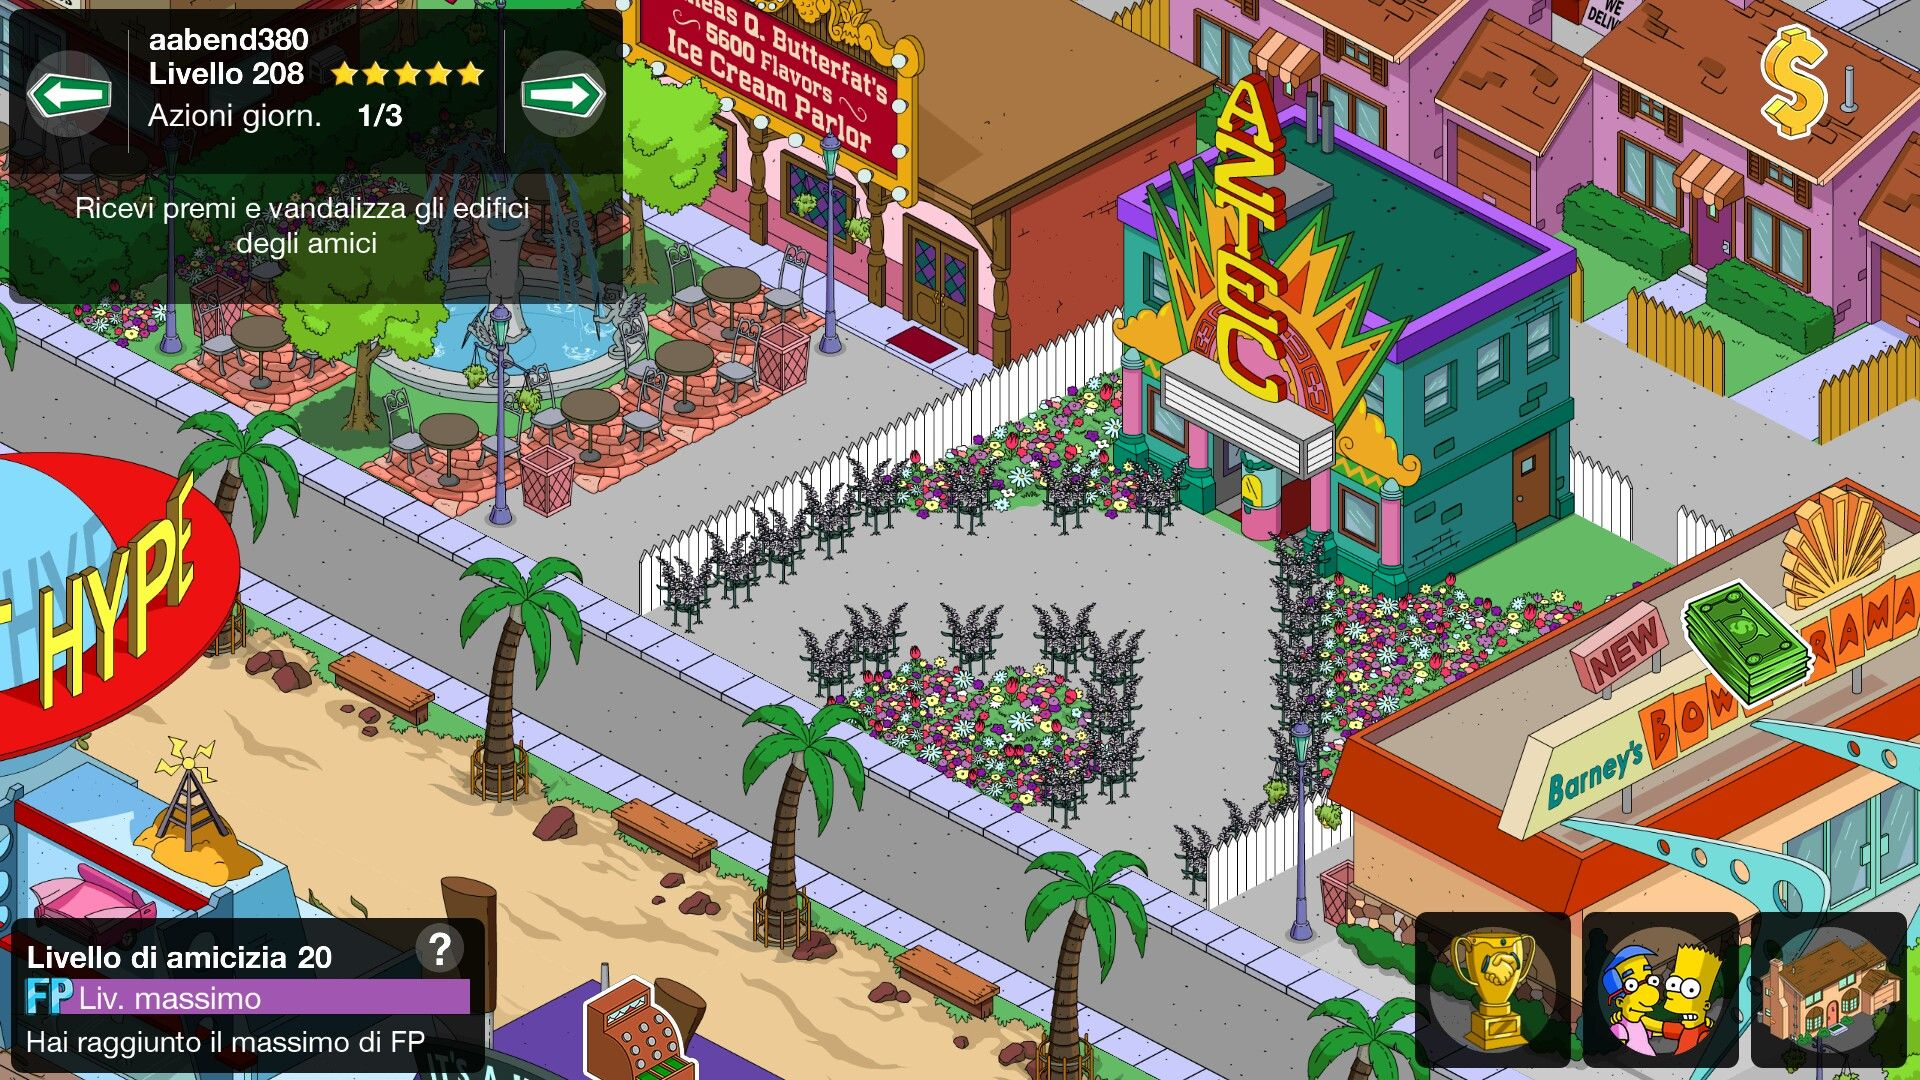 cinema aztec bowlarama The simpsons game, Cinema, The